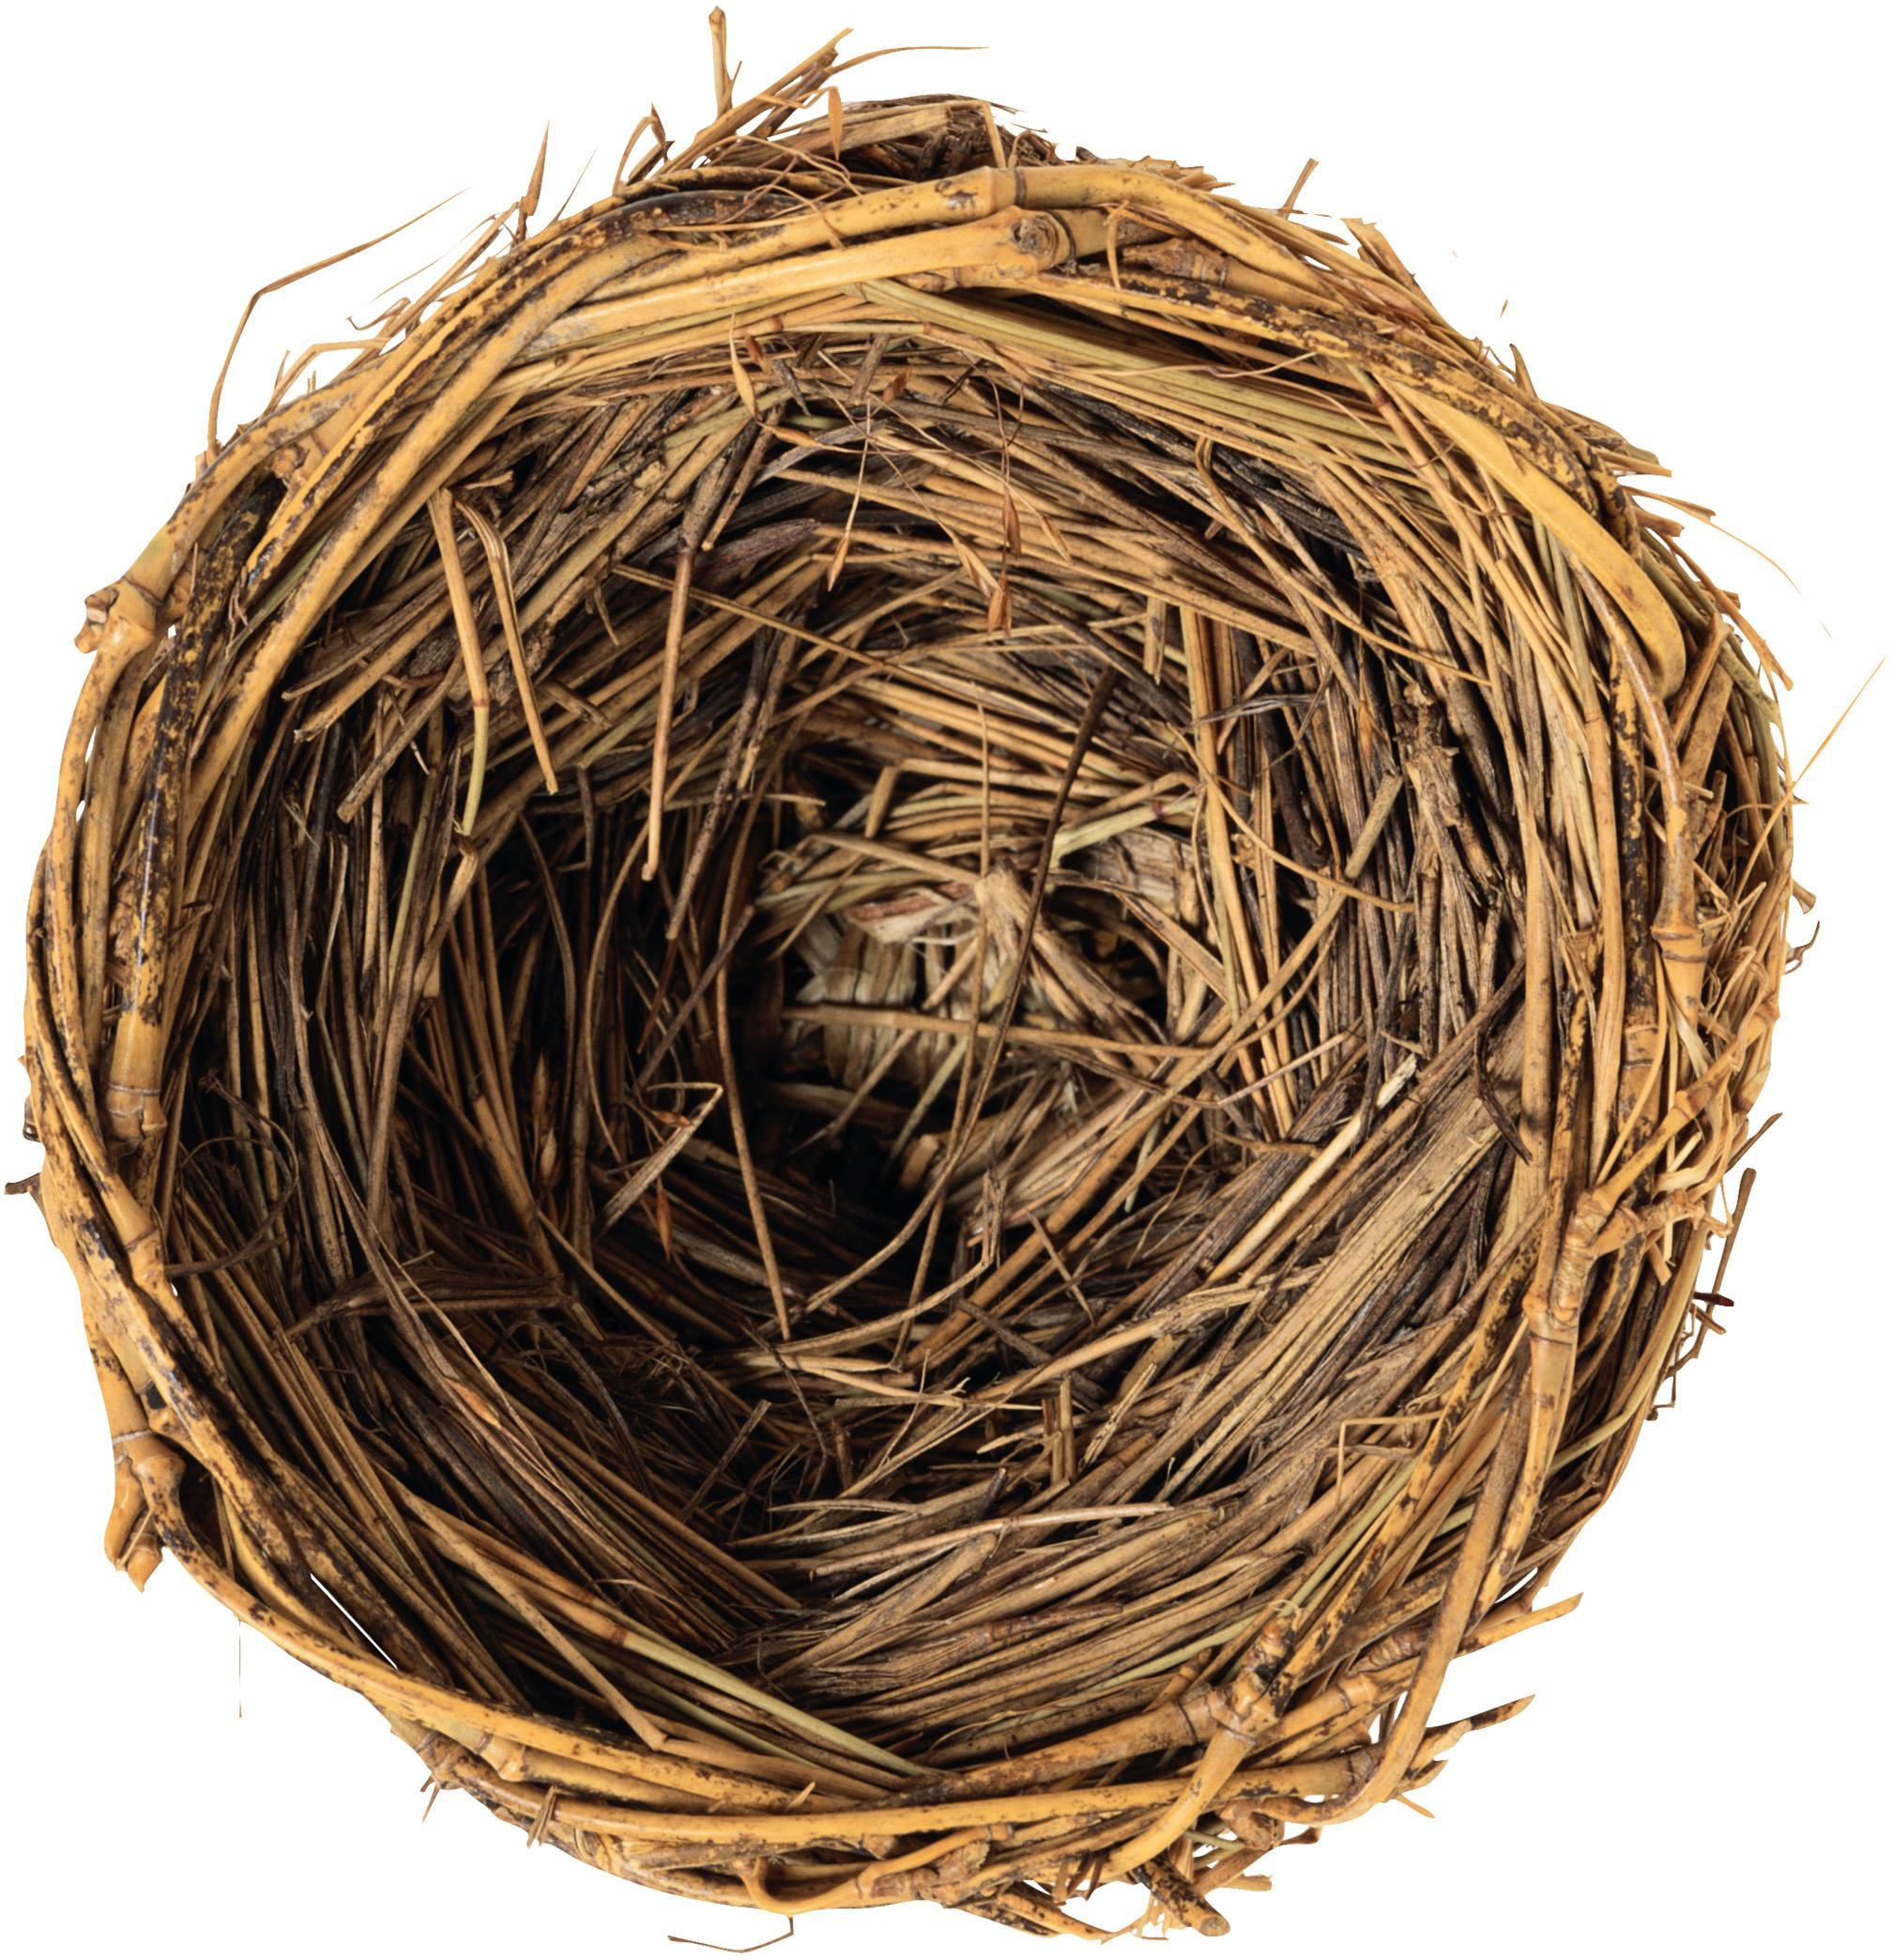 Nest clipart bird's nest. Edible birds bird clip